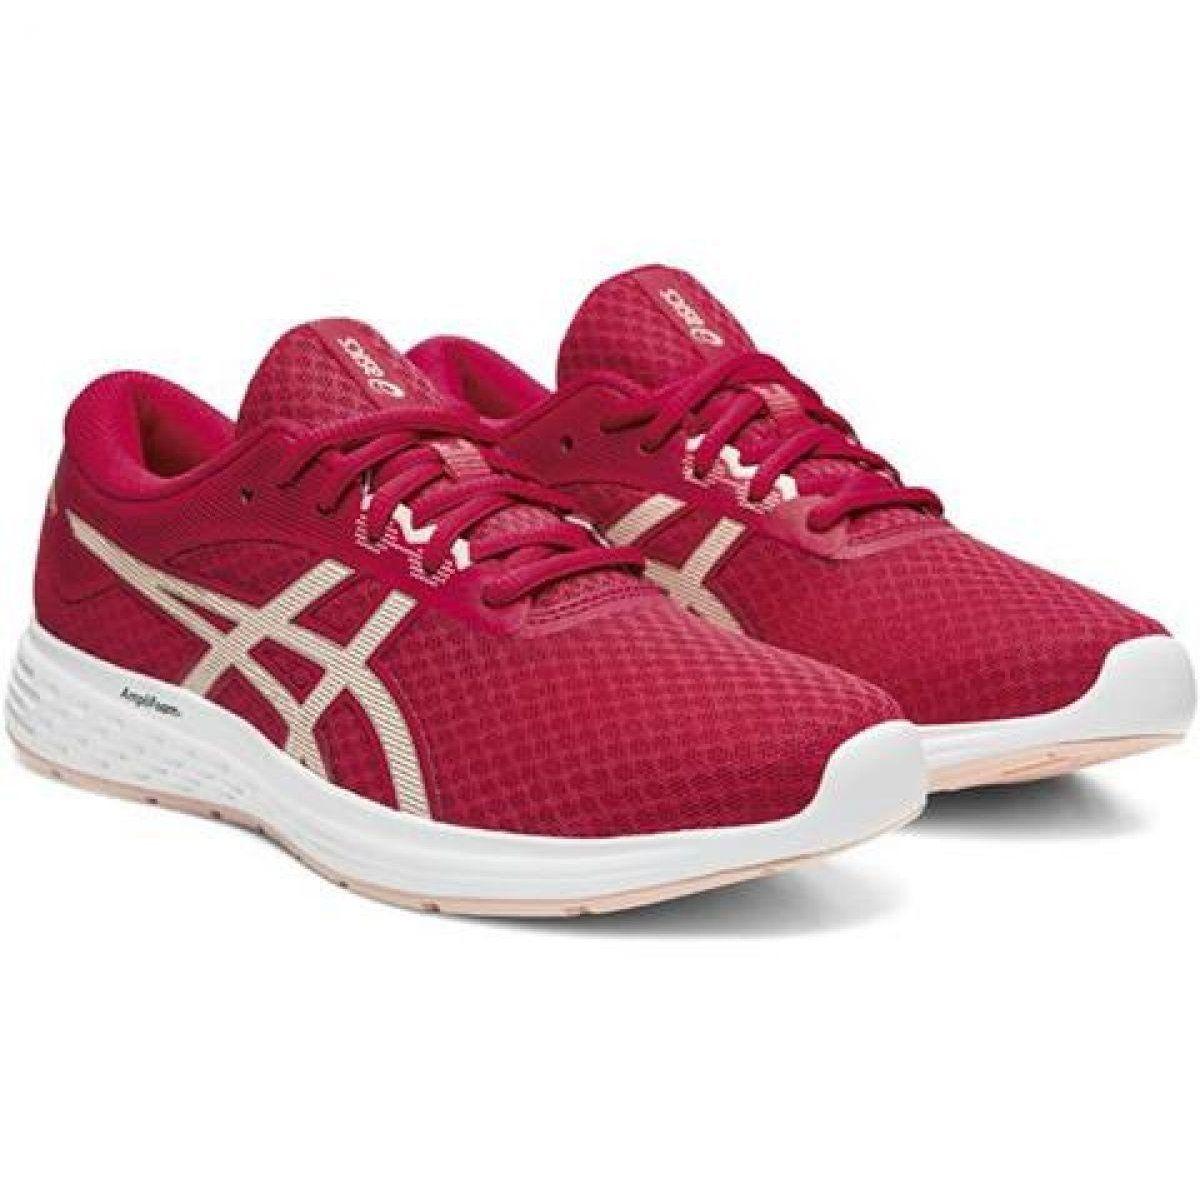 Buty Biegowe Asics Gel Patriot 11 W 1012a484 700 Rozowe Neutral Running Shoes Asics Womens Neutrals